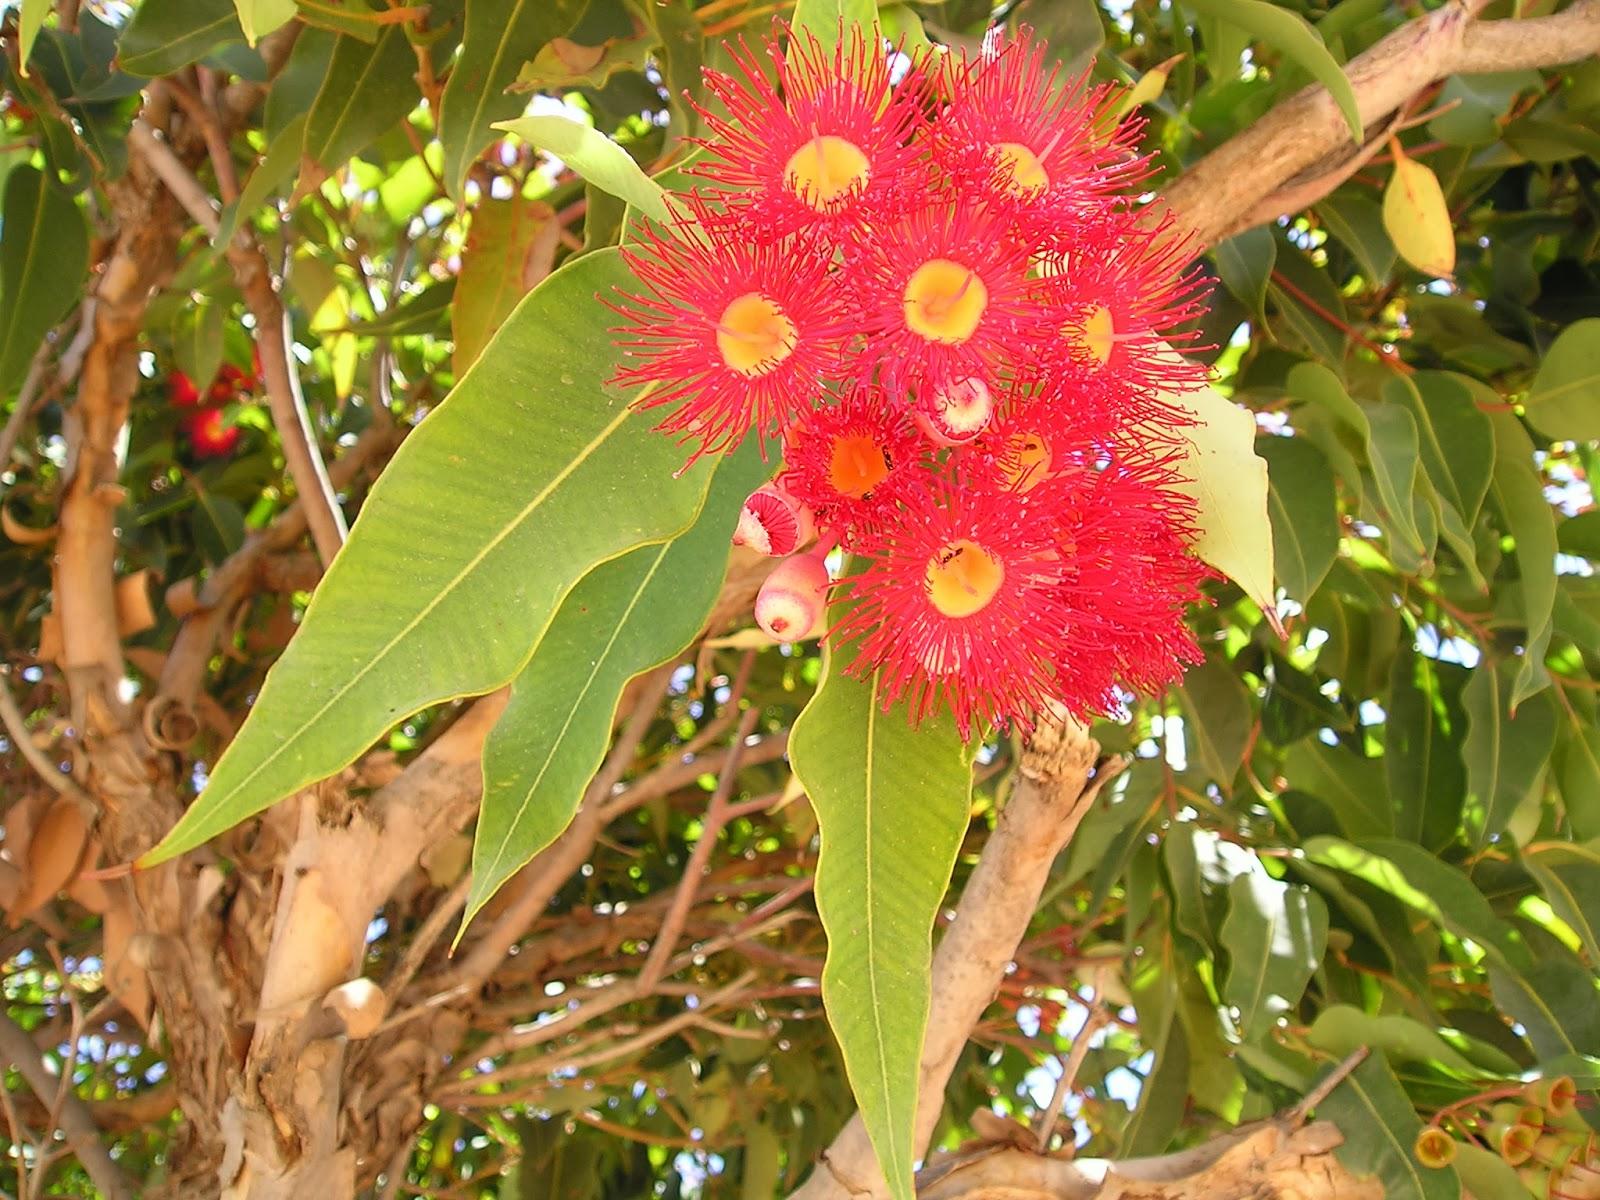 basic gardening tips plus australian native plants  basic gardening tip for australian native plants